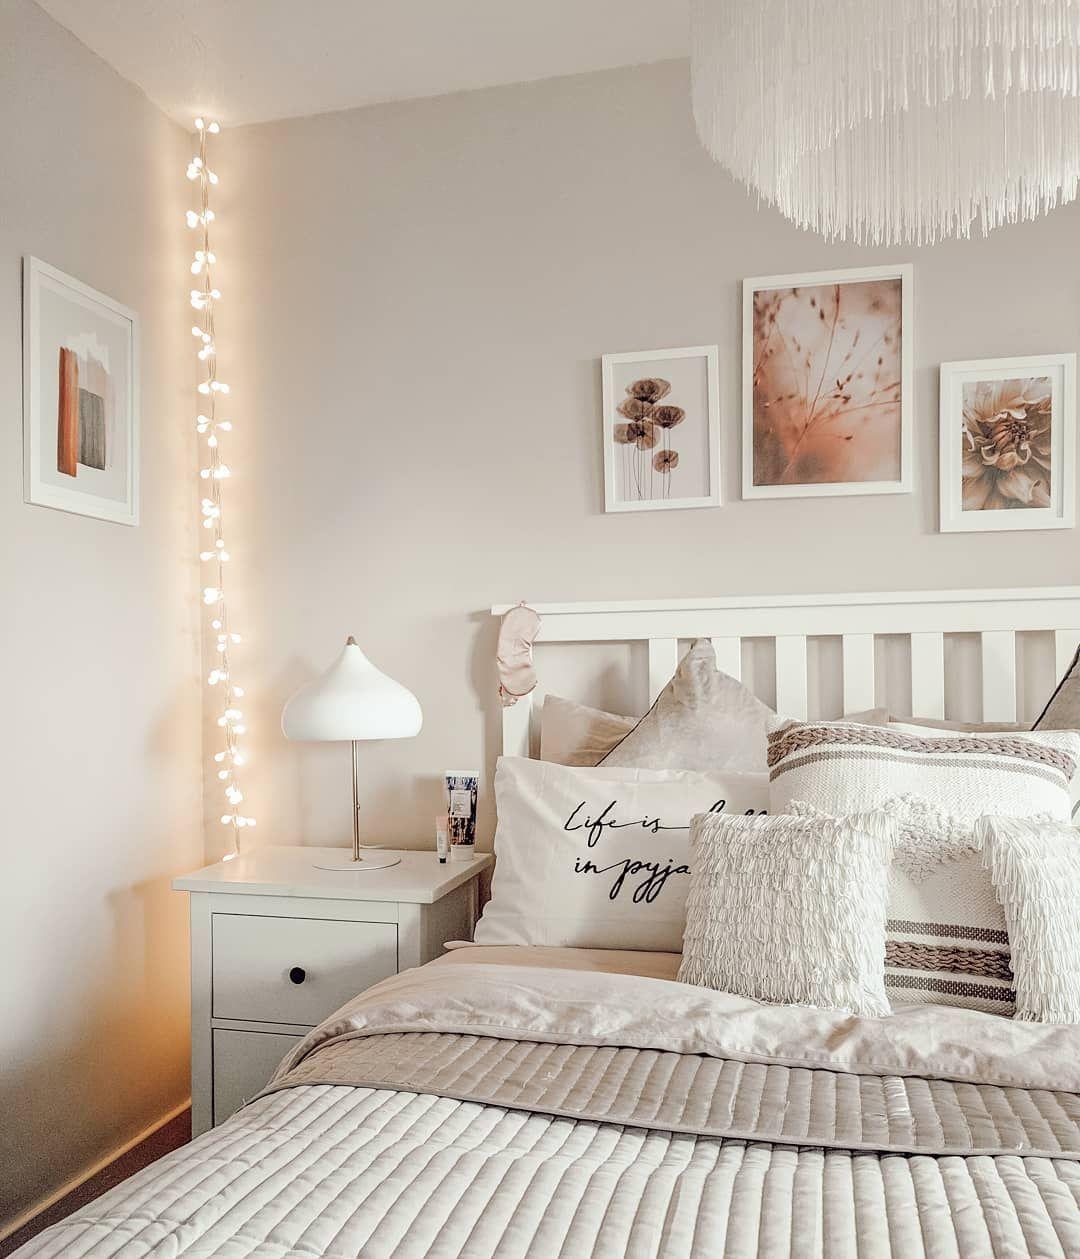 Scandi Boho bedroom with white IKEA Hemnes furniture and fairy